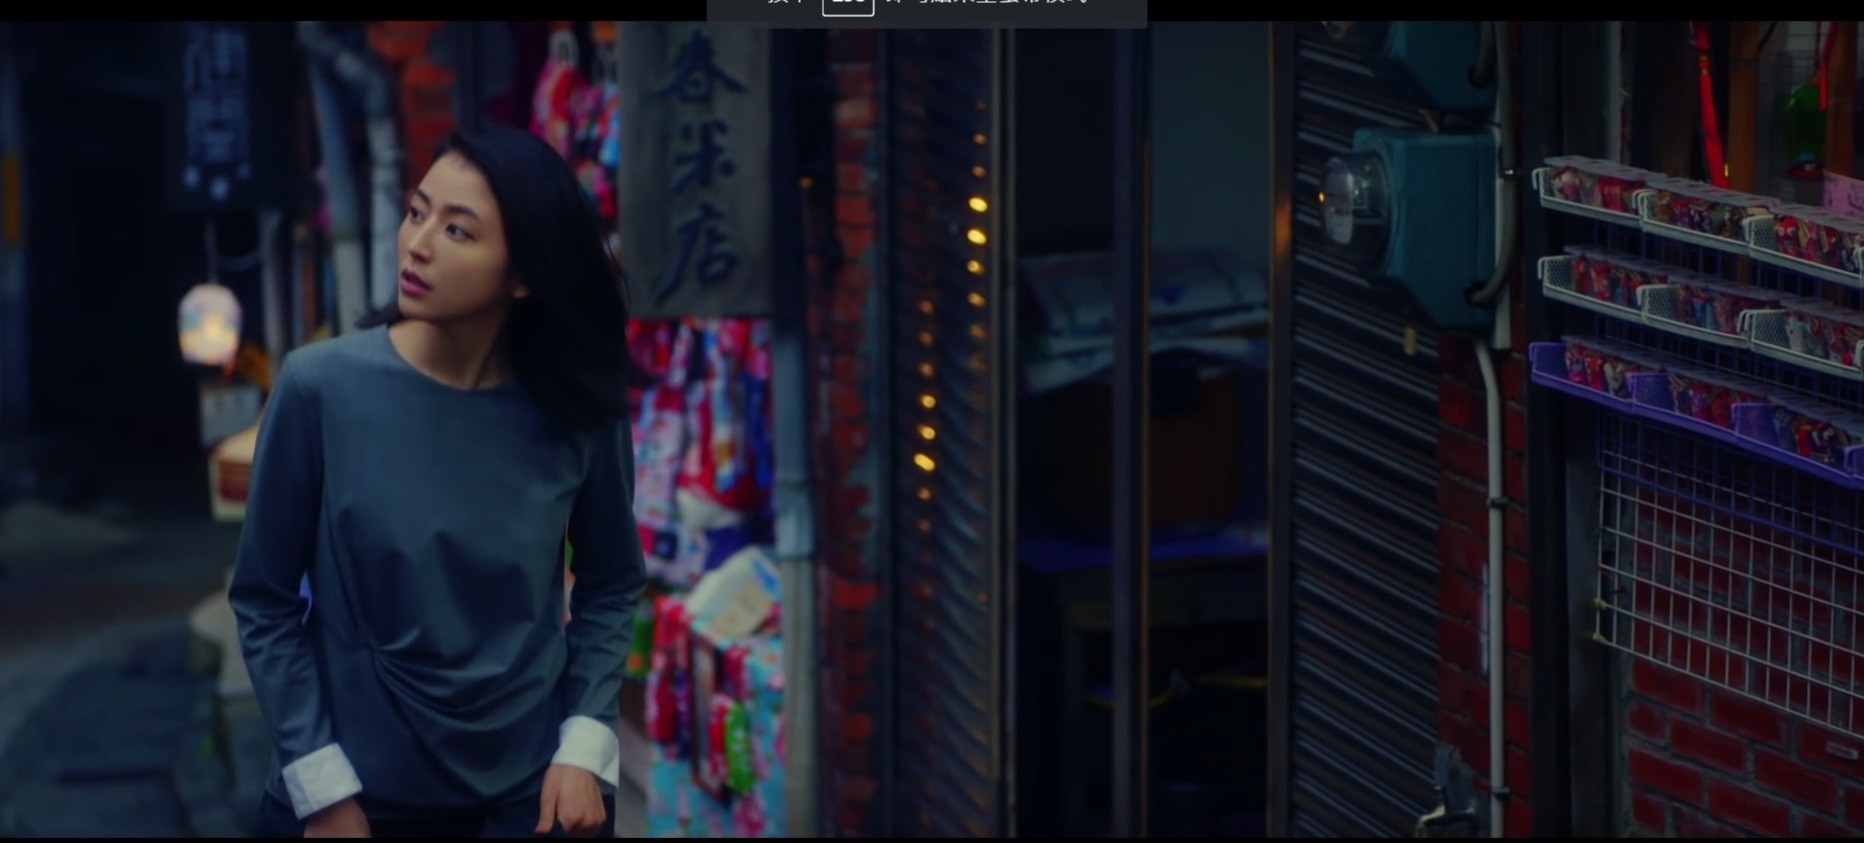 「Meet Colors!台湾」的圖片搜尋結果